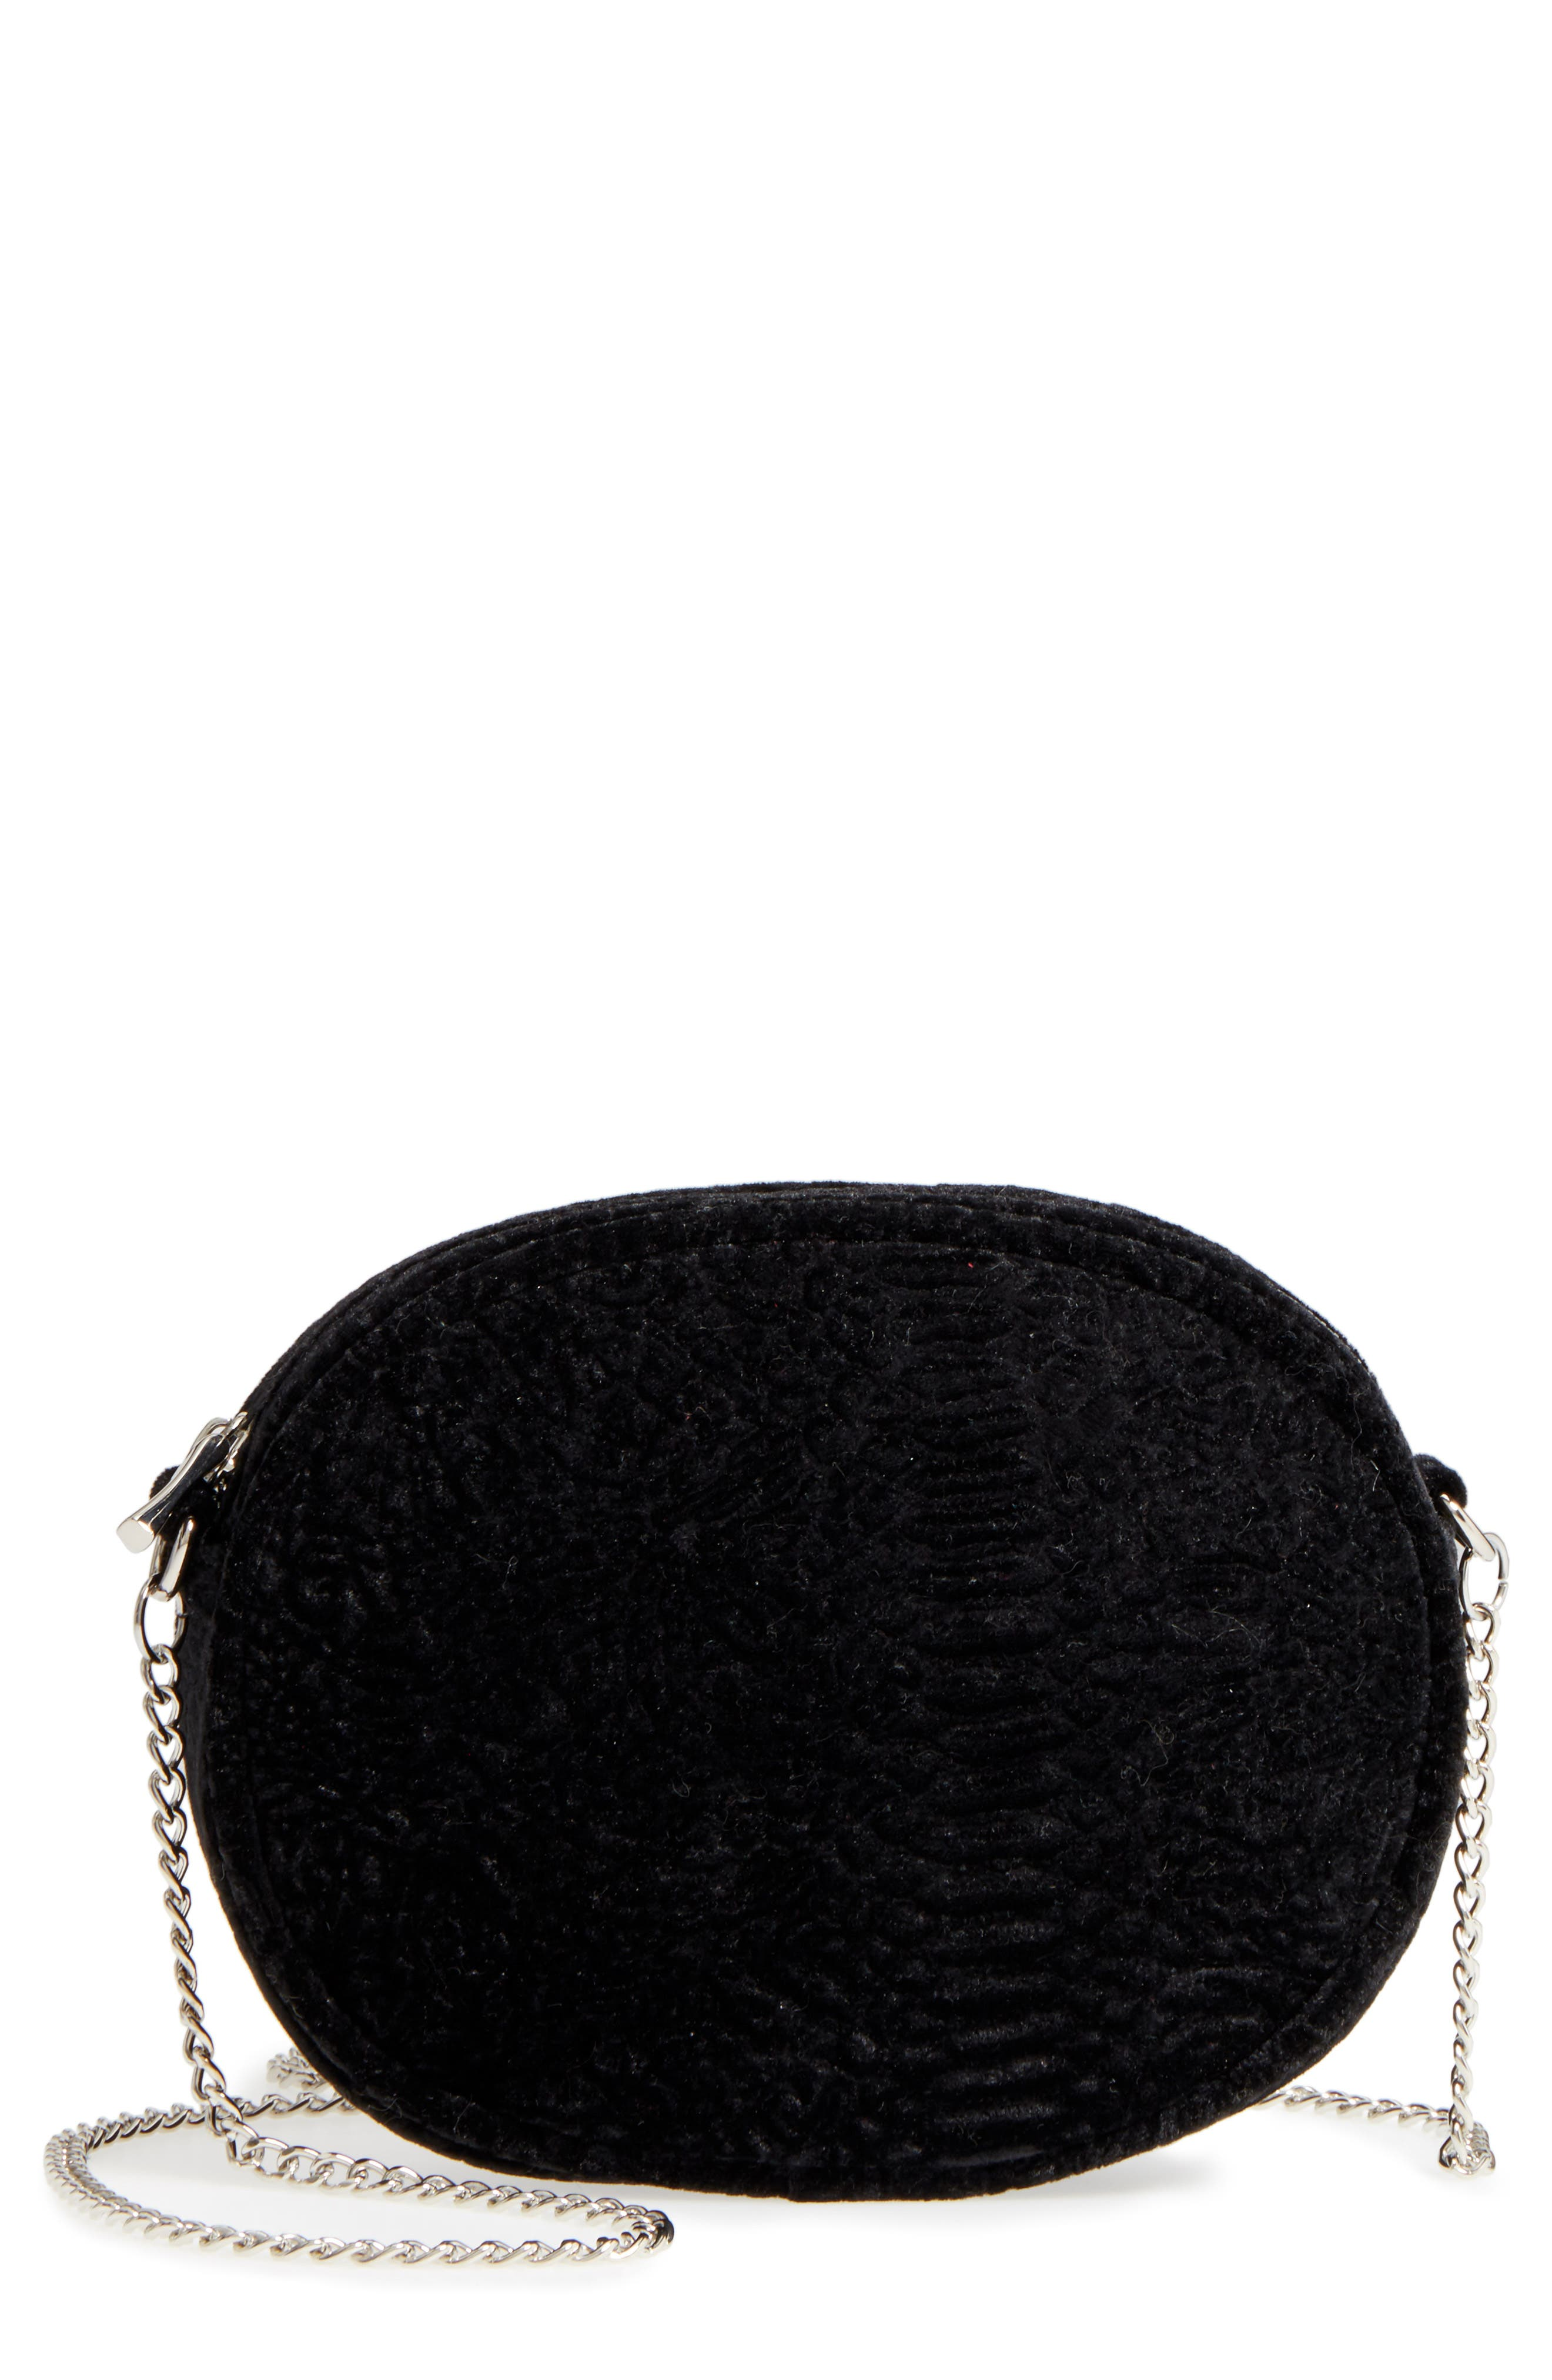 Miza Crossbody Bag,                         Main,                         color, 001